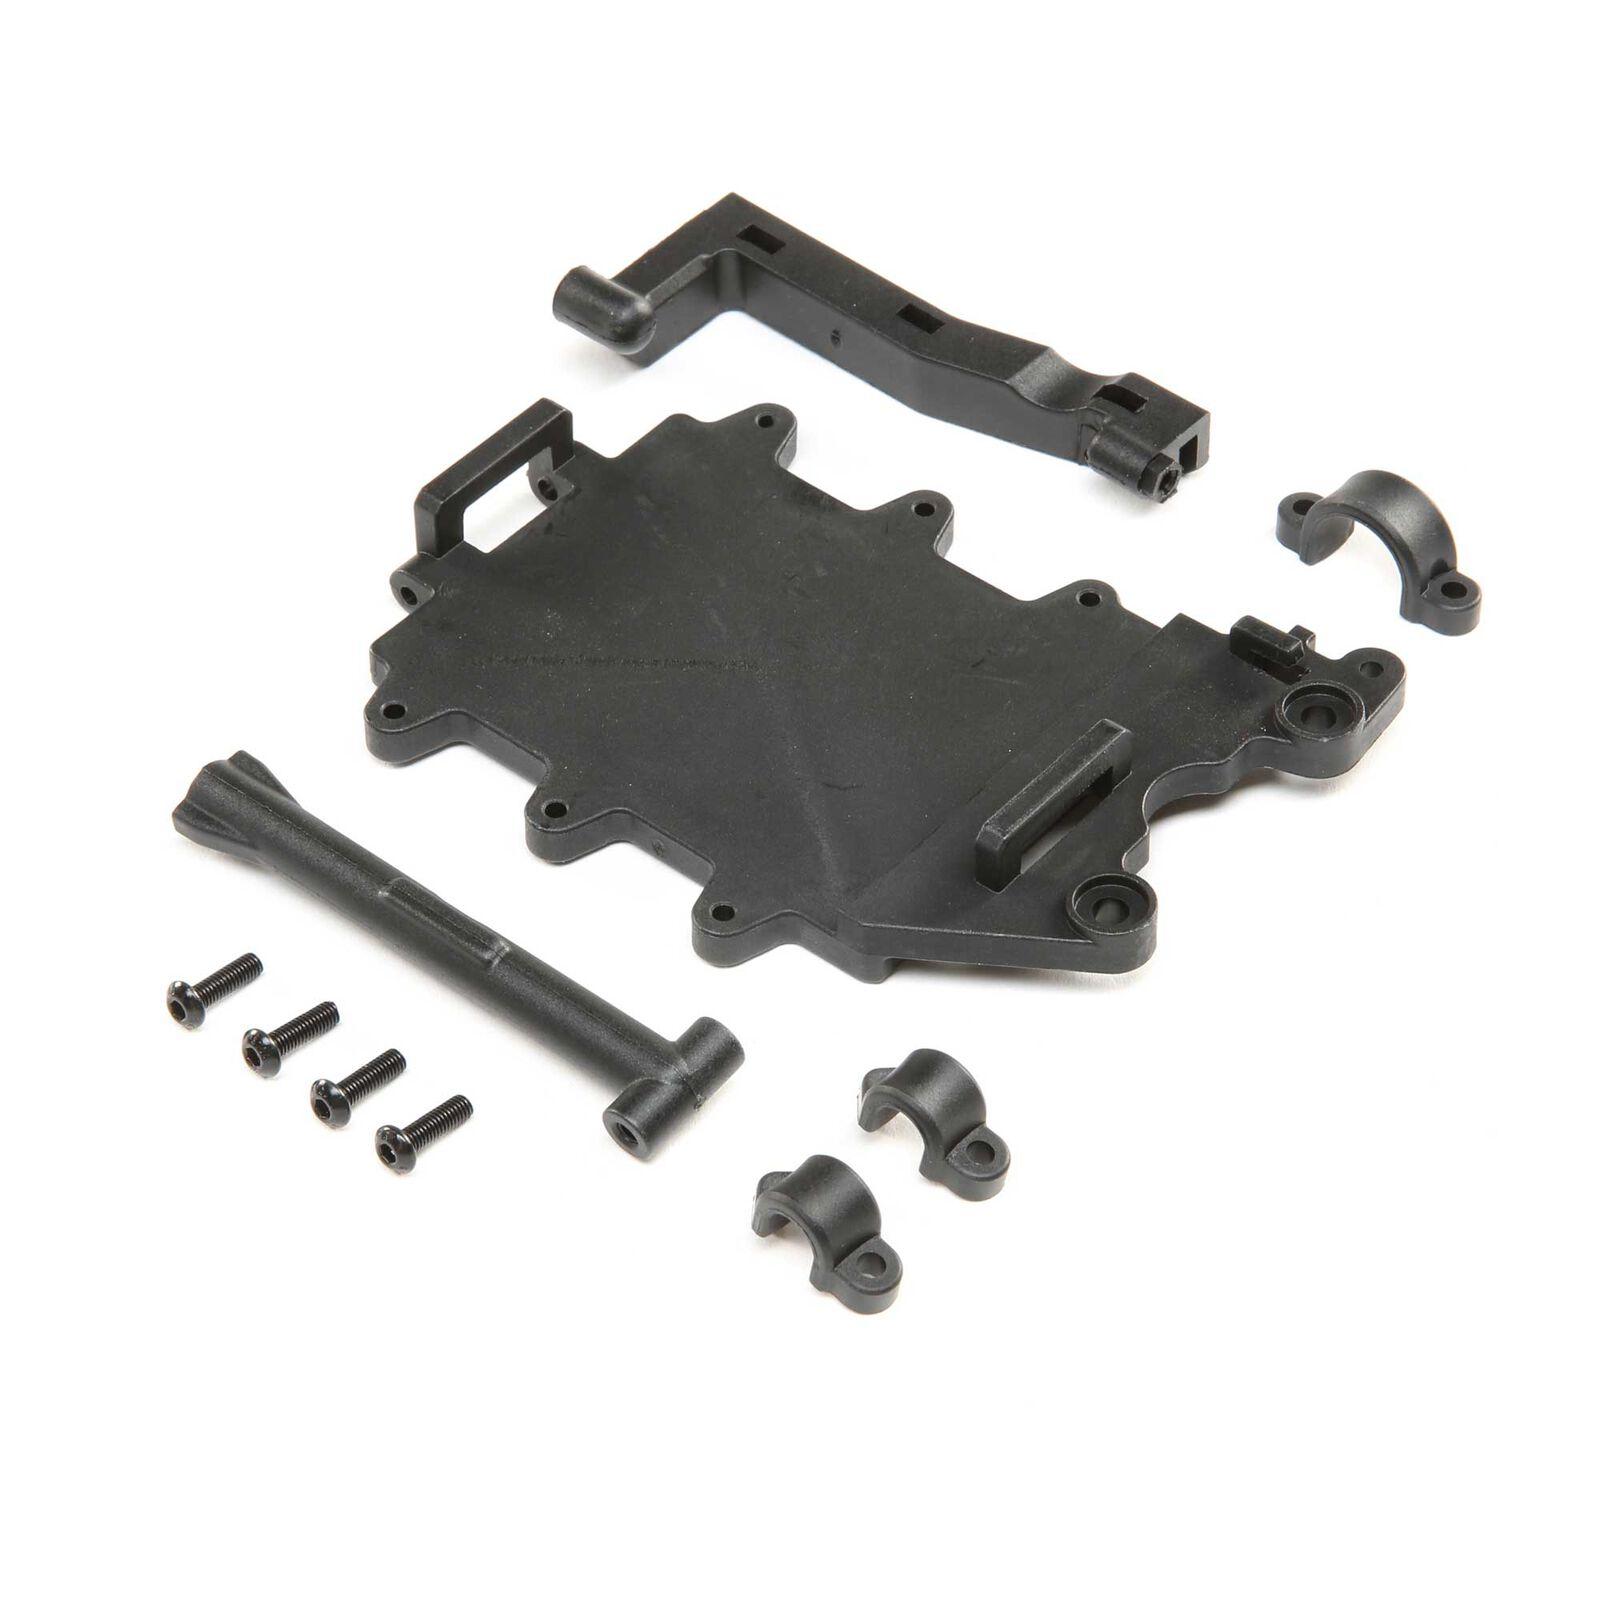 ESC Mounting Plate: DBXL-E 2.0